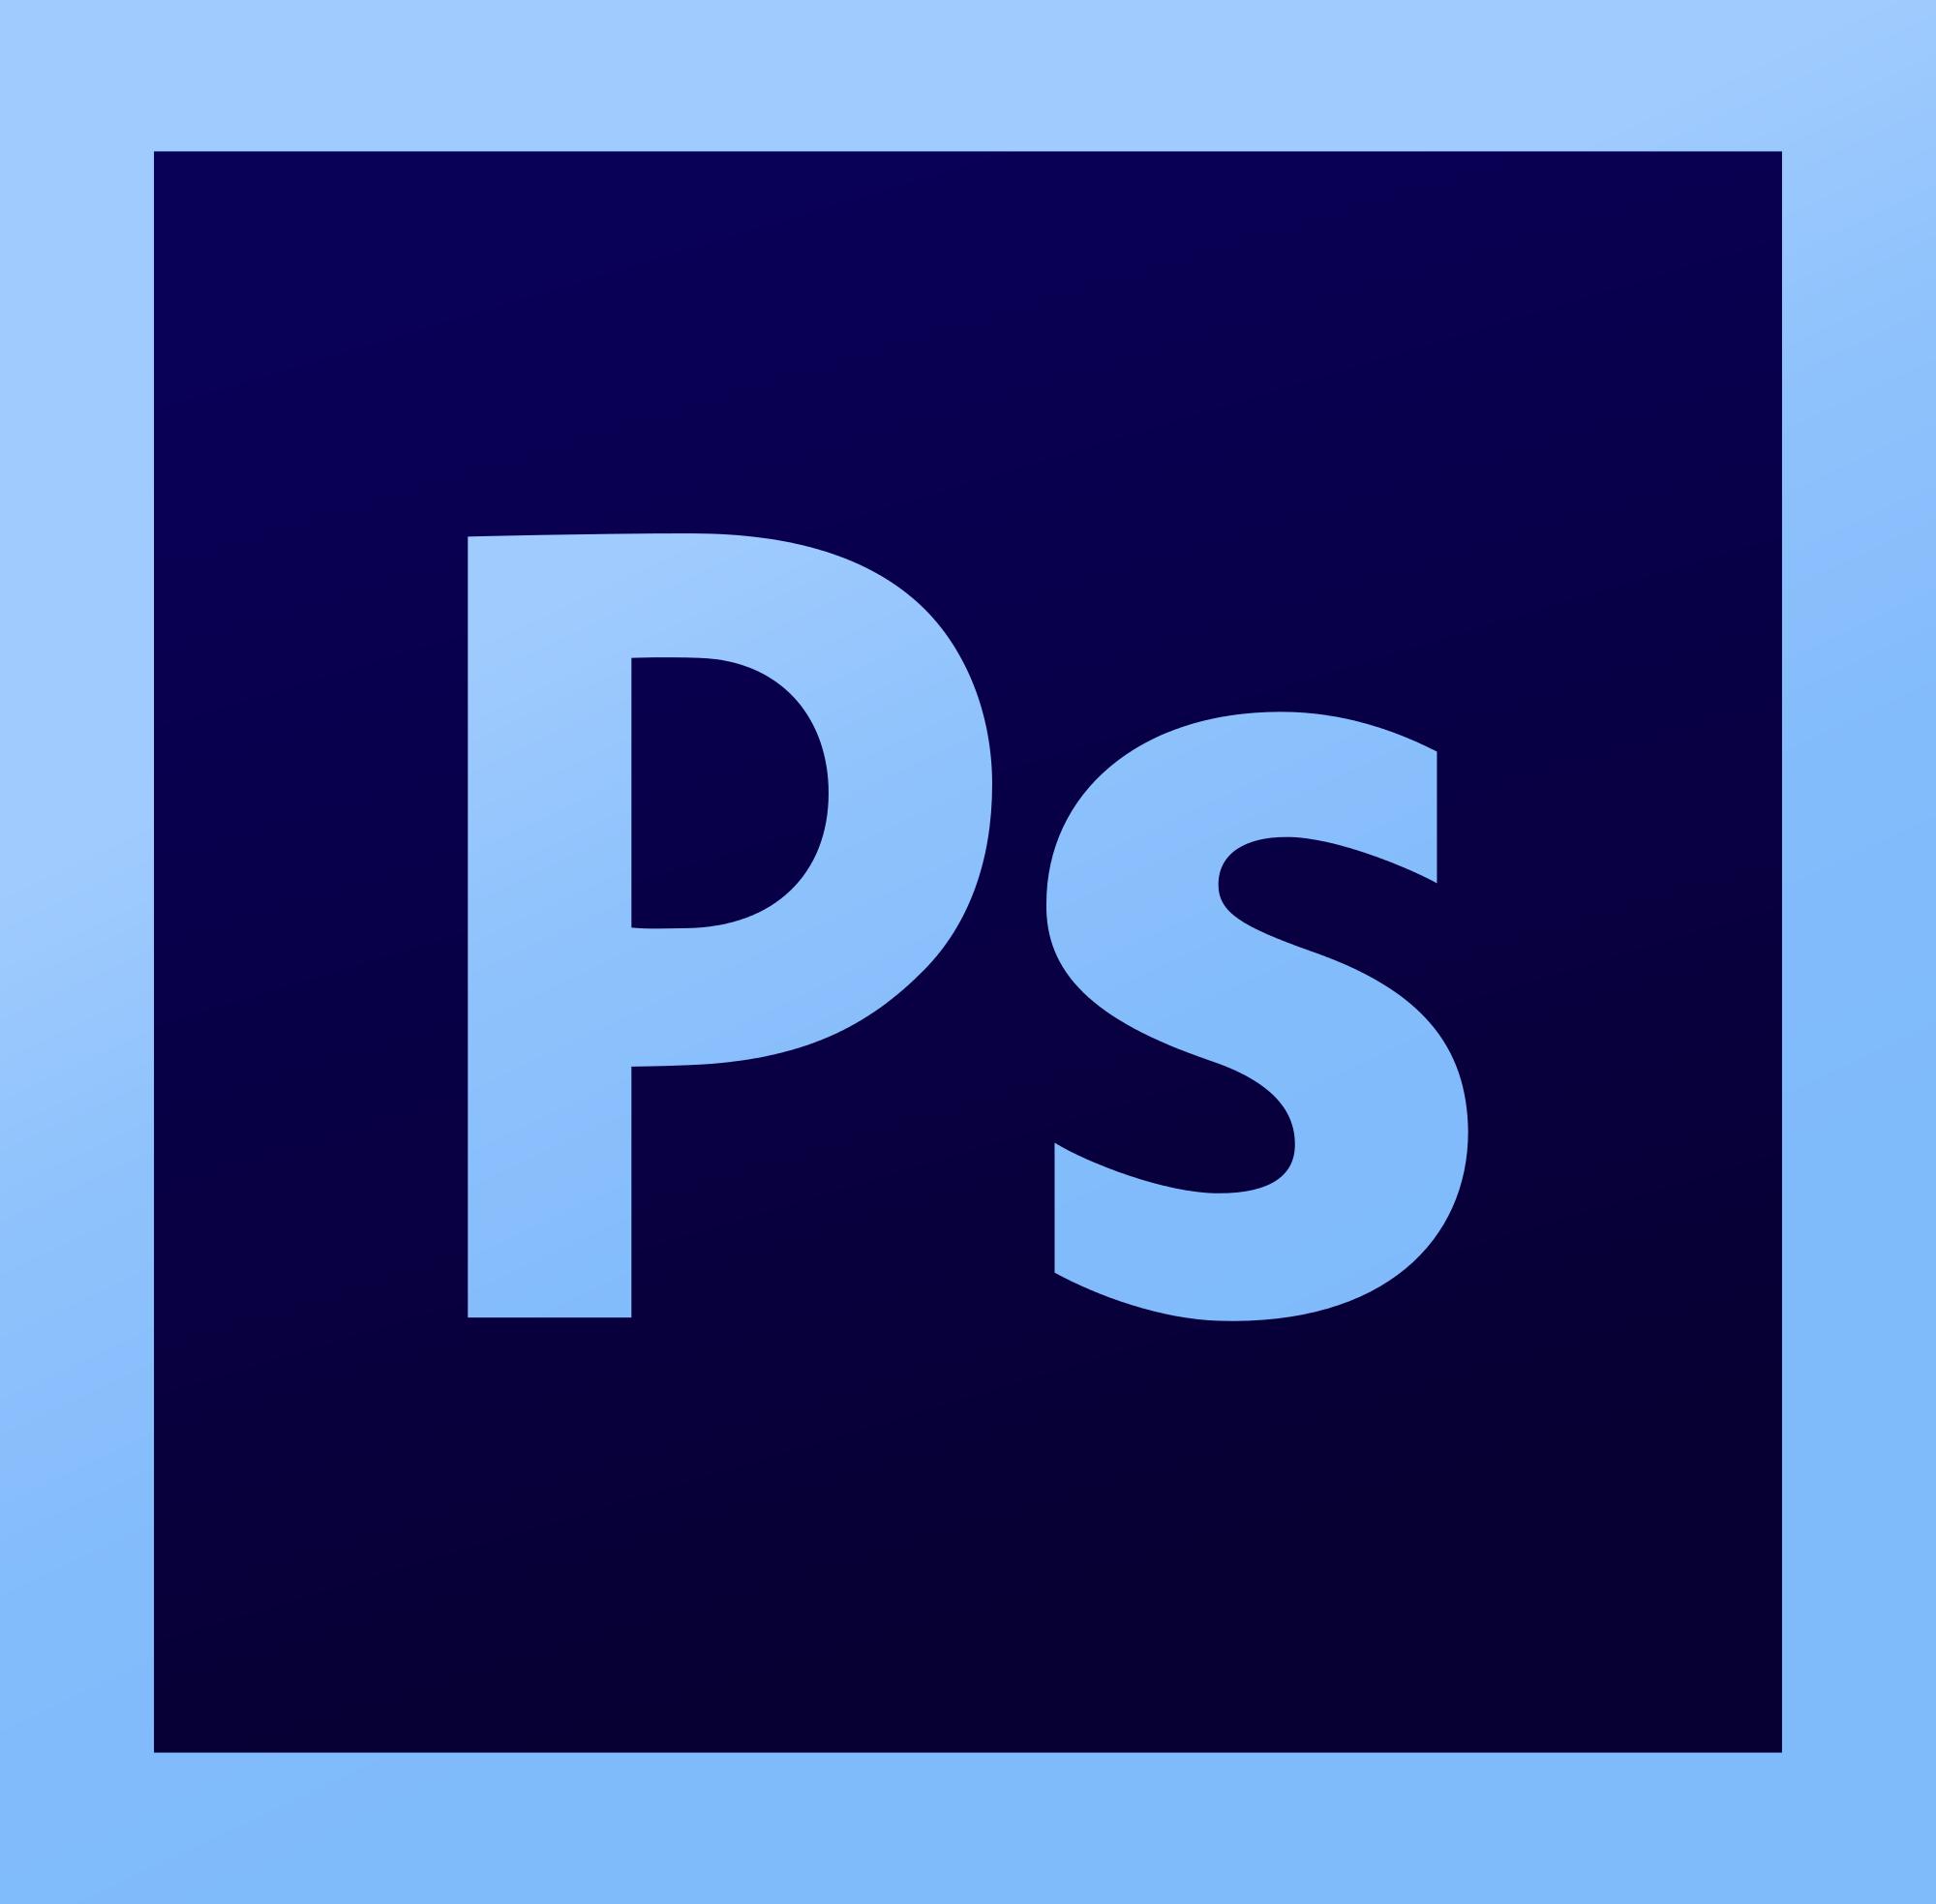 Adobe_Photoshop_CS6_icon.svg